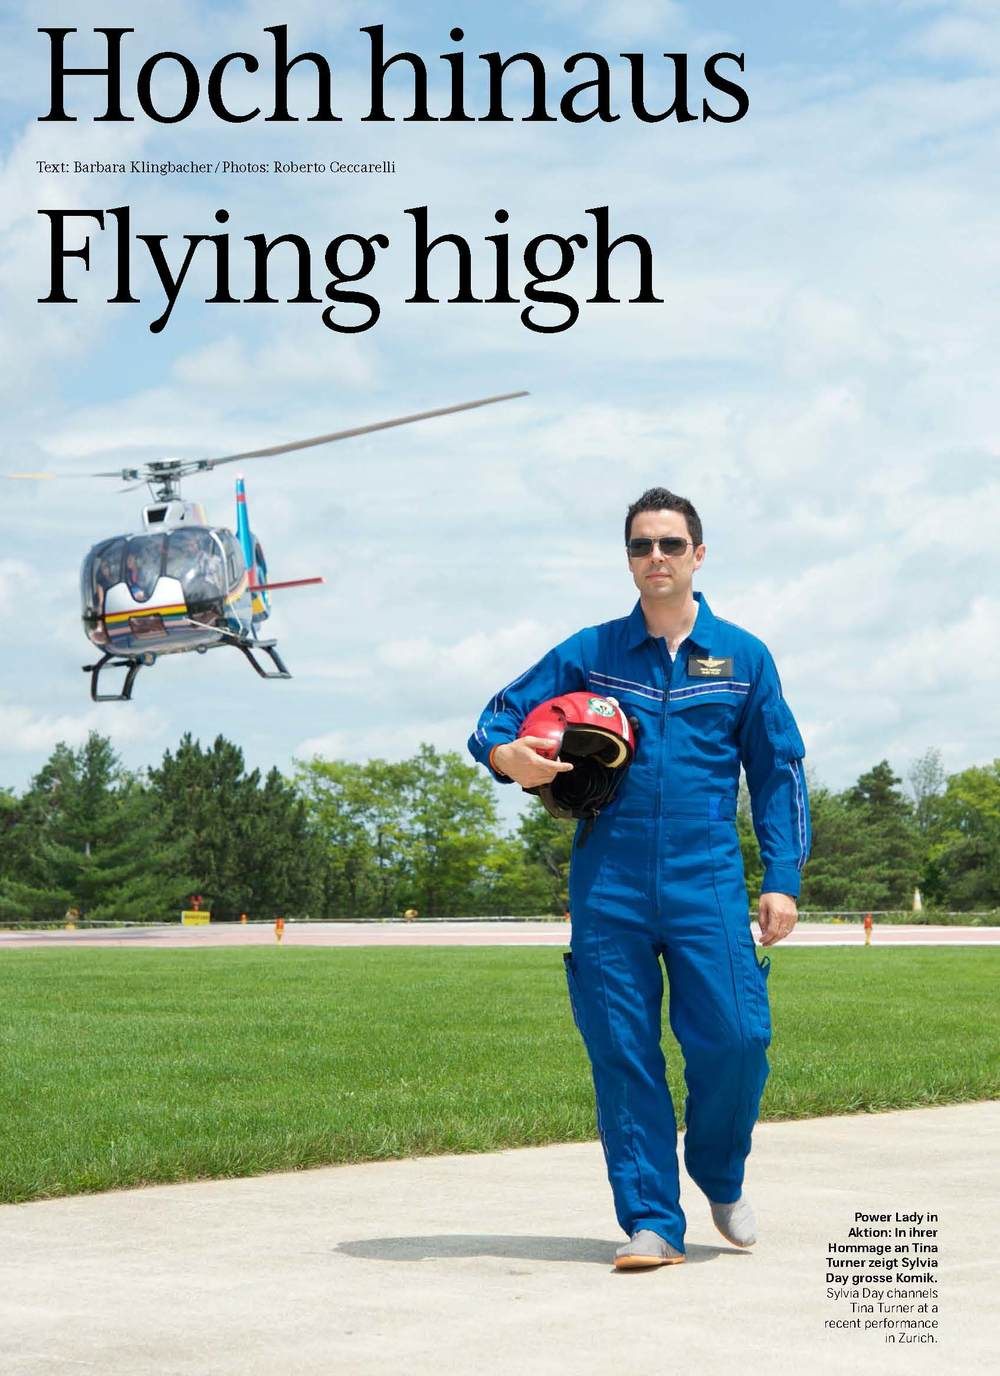 Niagara Helicopters Chief Pilot Niagara Falls